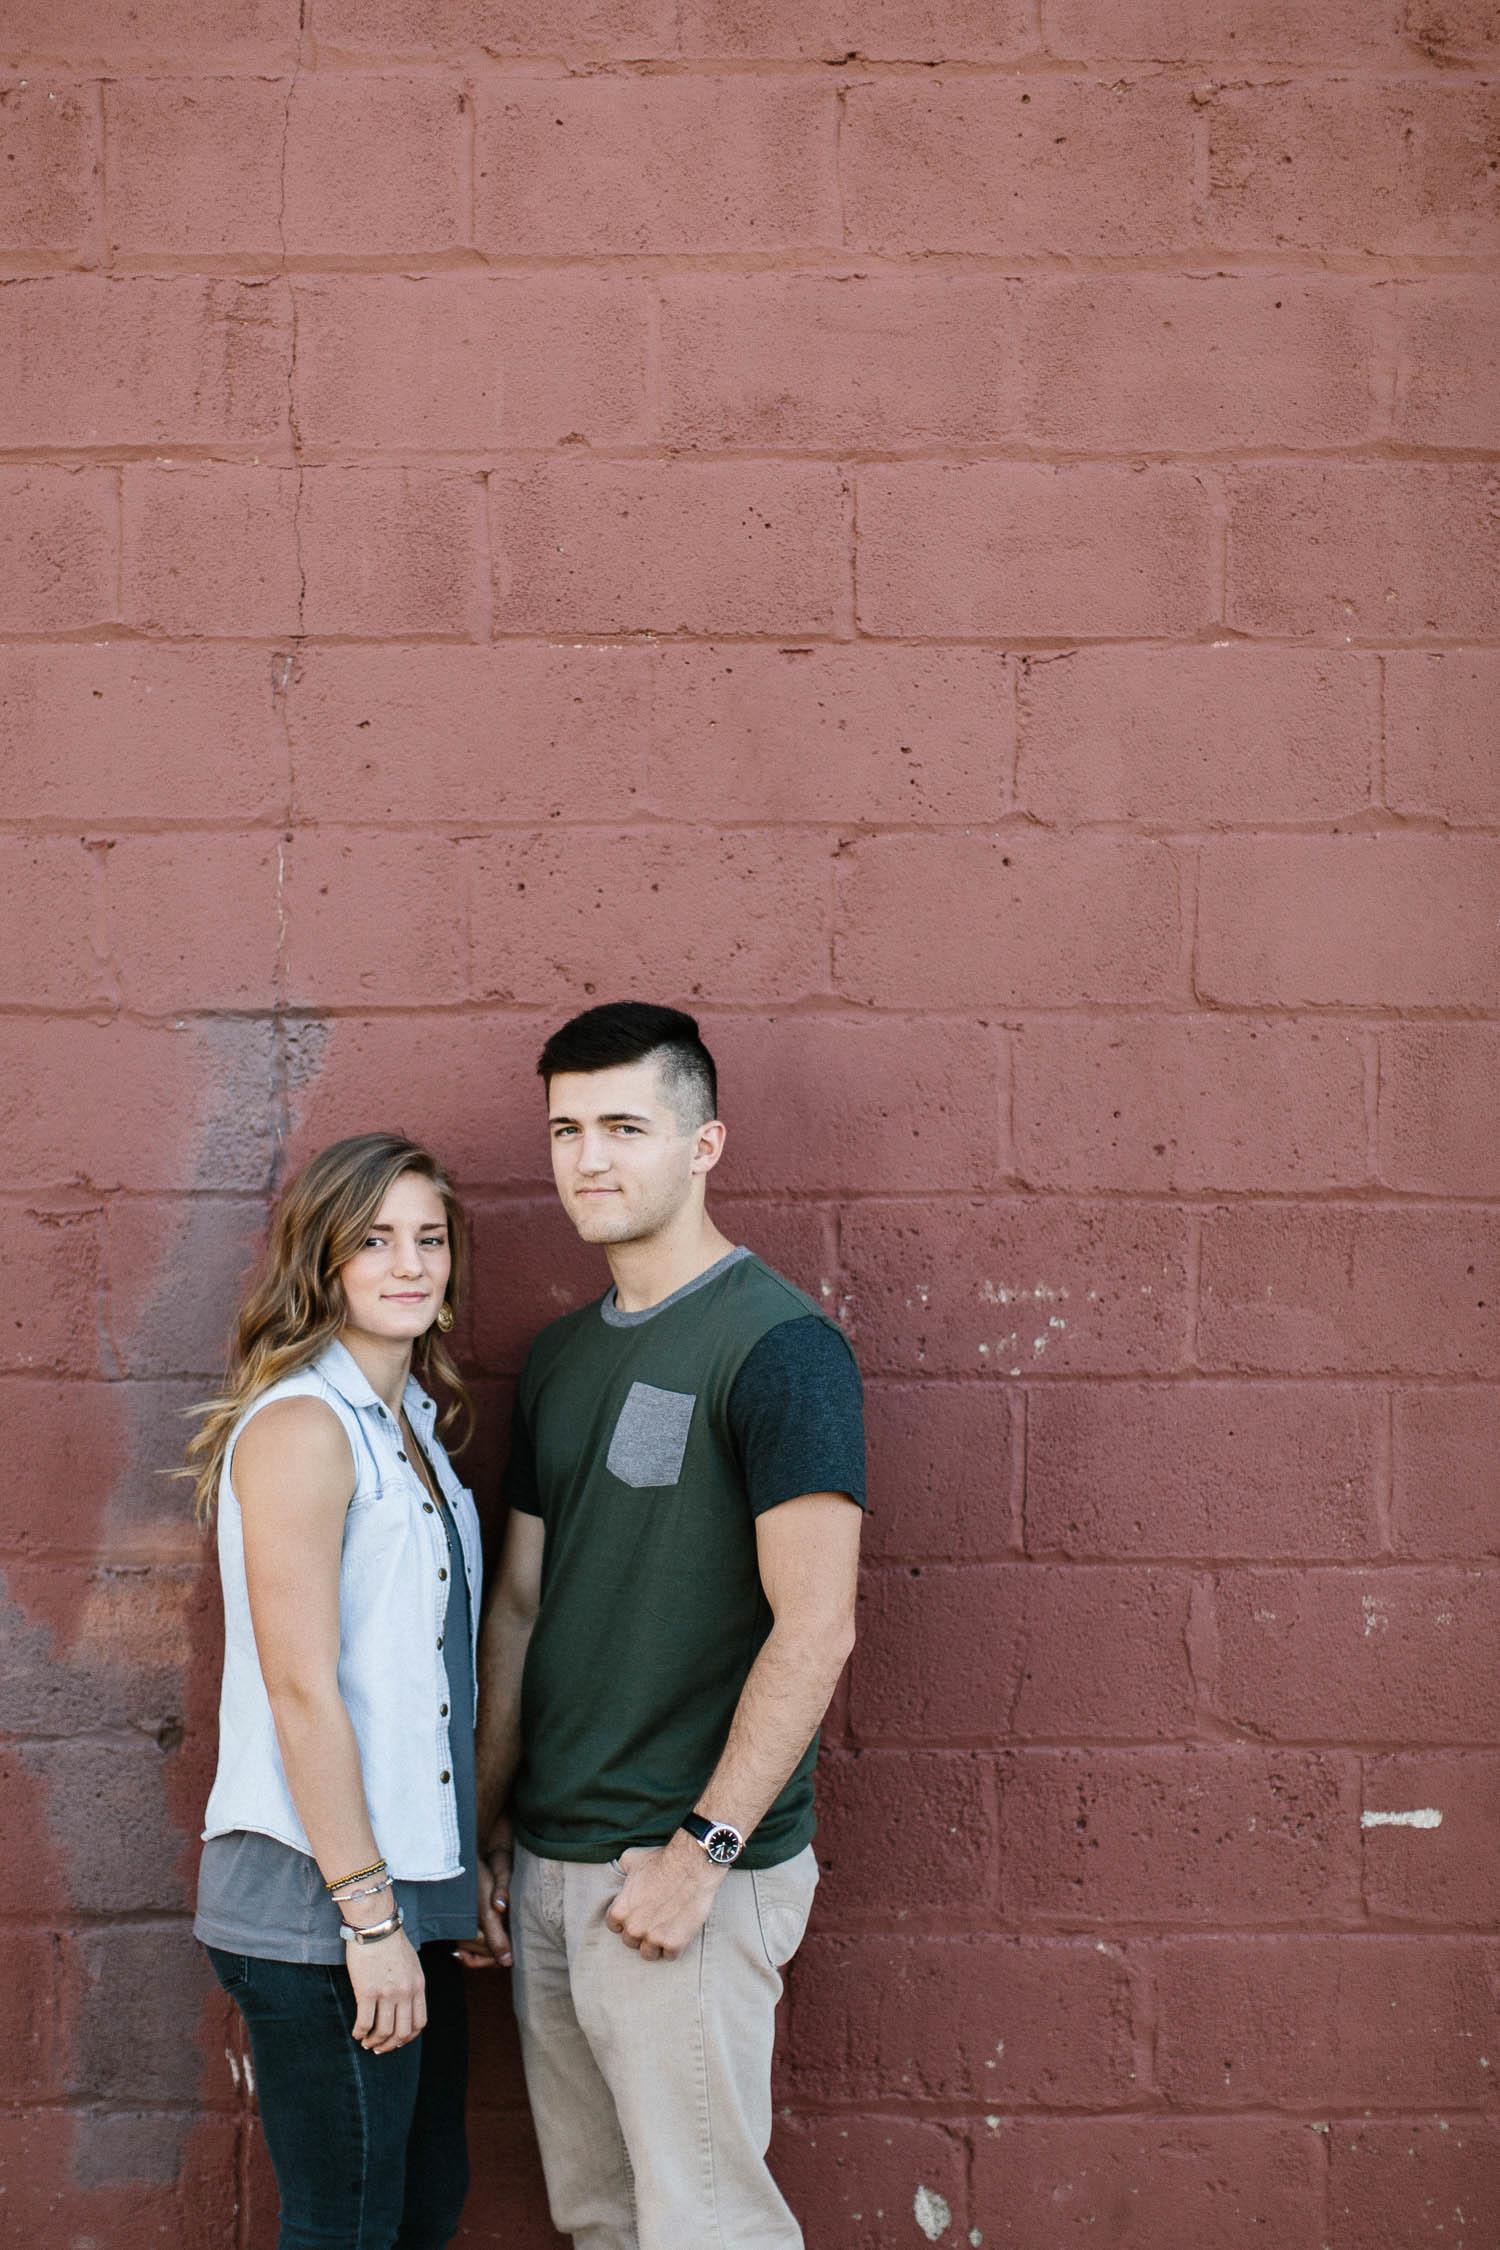 Romantic_Timeless_Downtown_SiouxFalls_Engagement_Wedding_Photographer_02.jpg